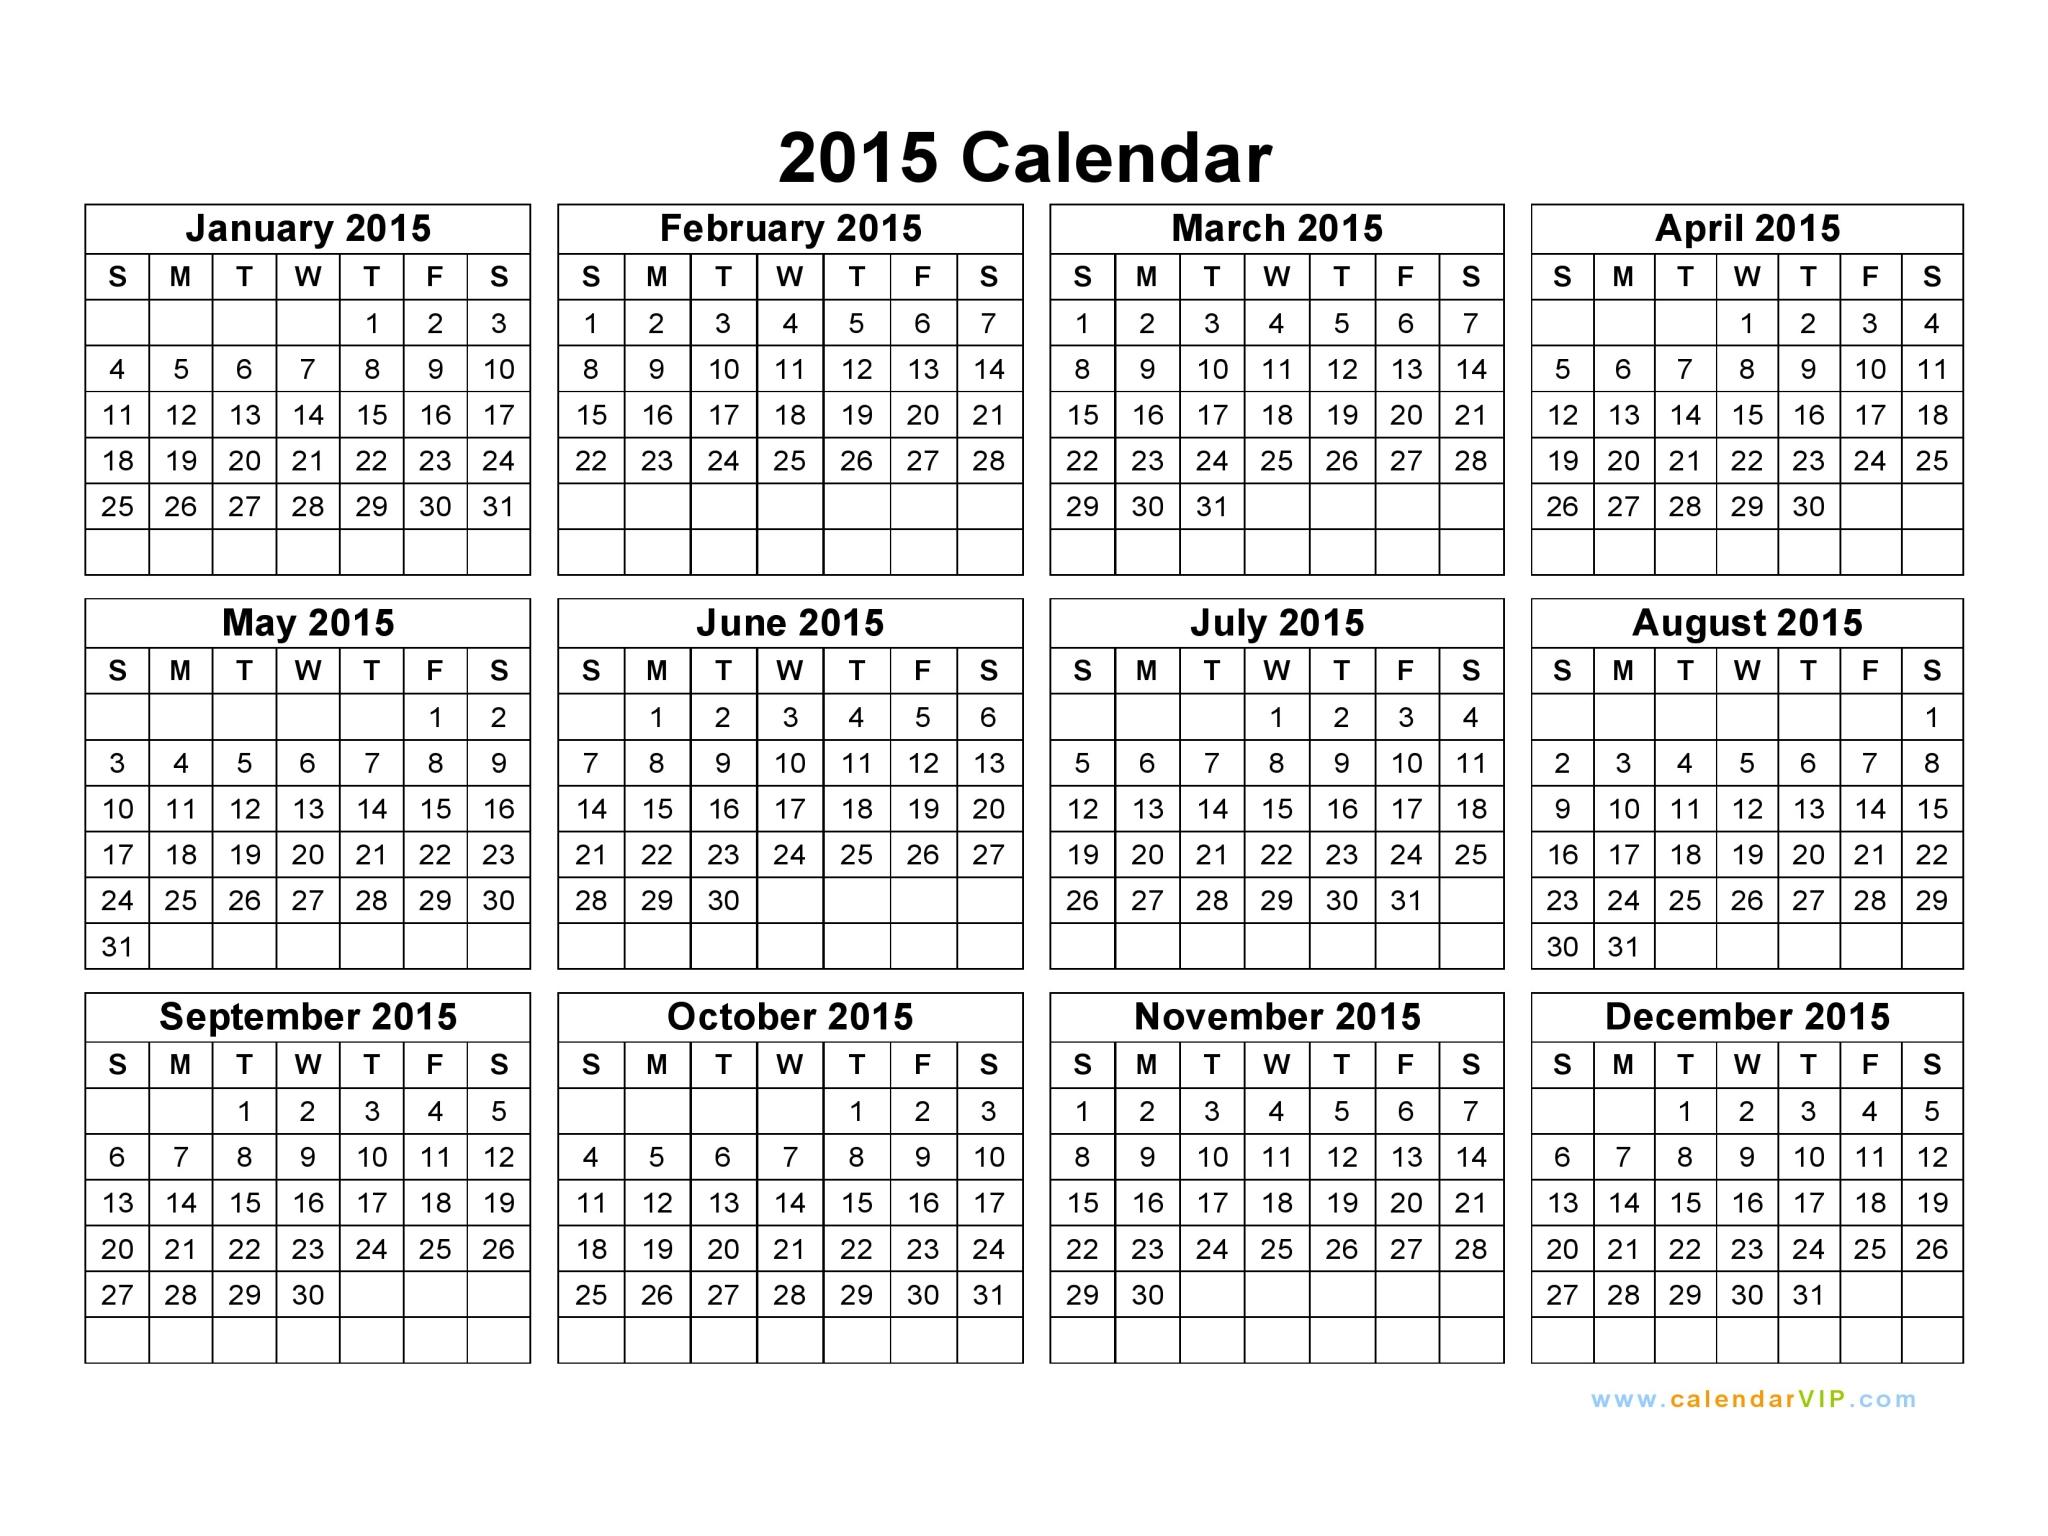 Calendars 2015 National Holidays